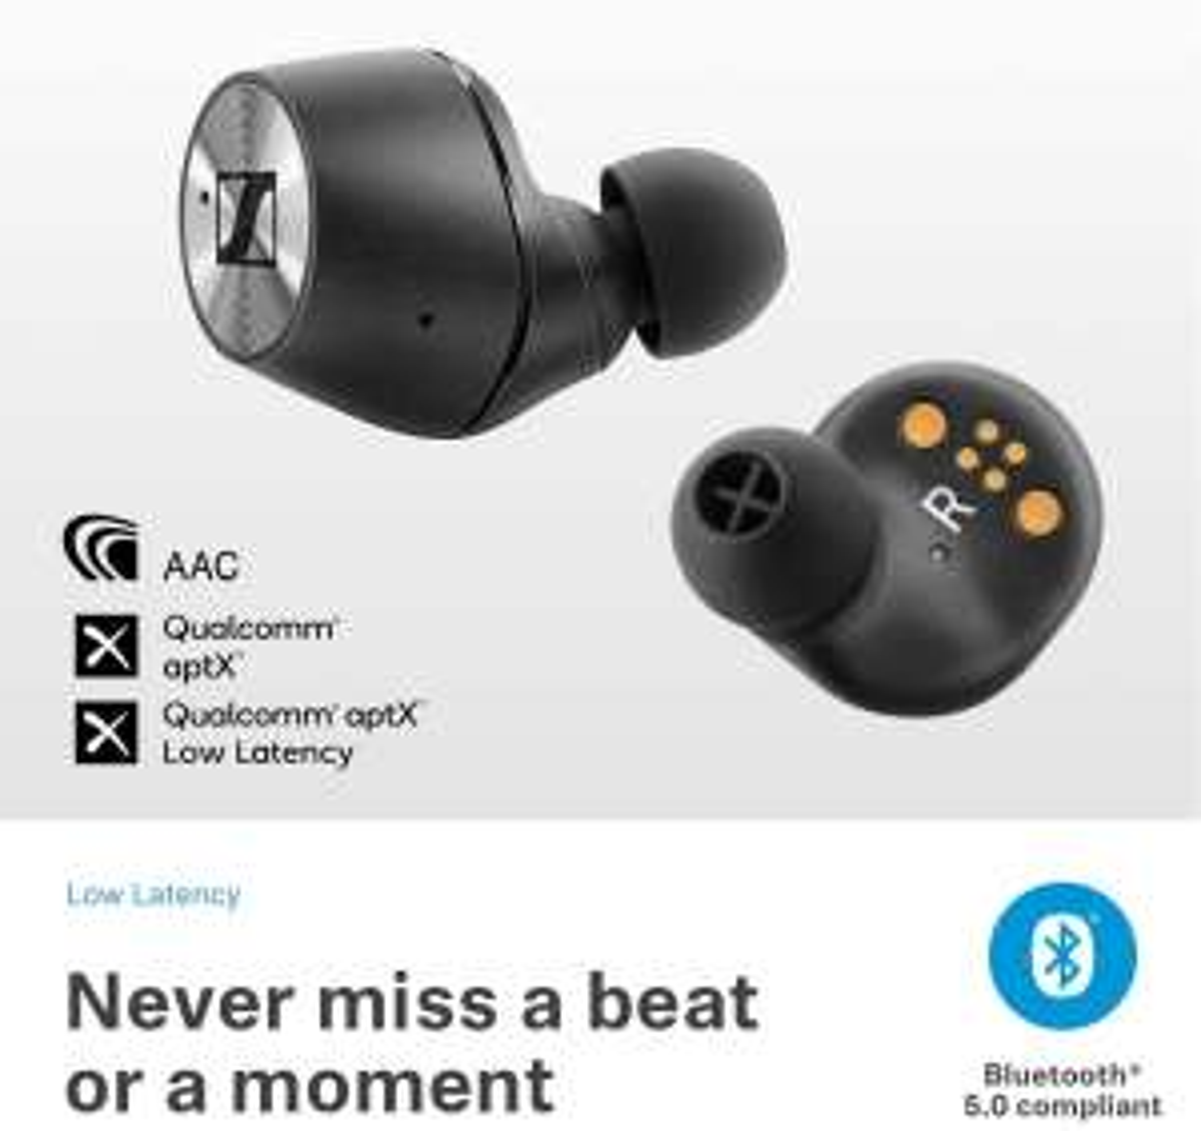 Sennheiser MOMENTUM True Wireless In-Ear Headphones with Touch Control - £135 via Unidays